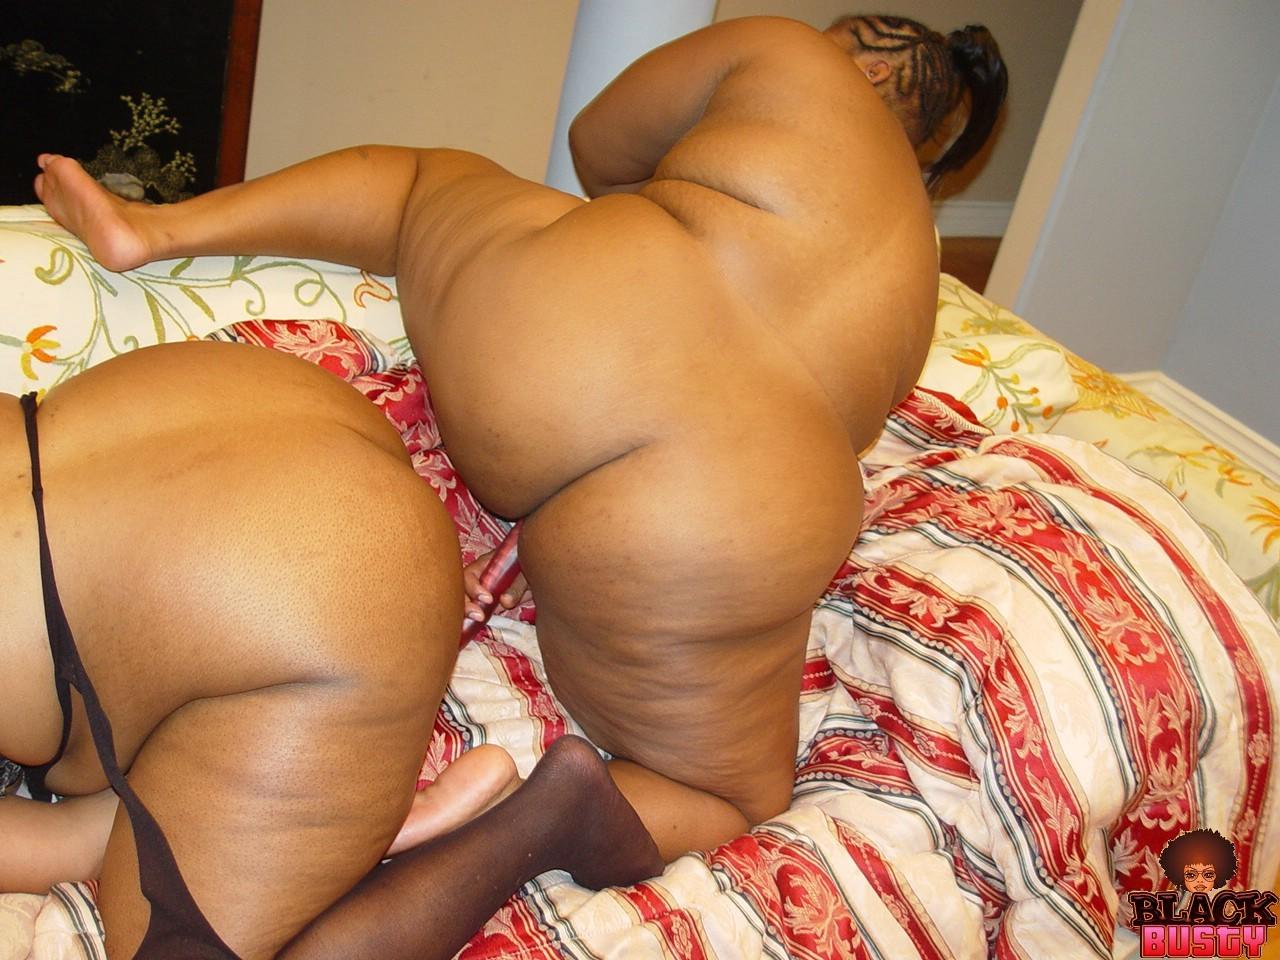 Ebony bbw lesbian hardcore